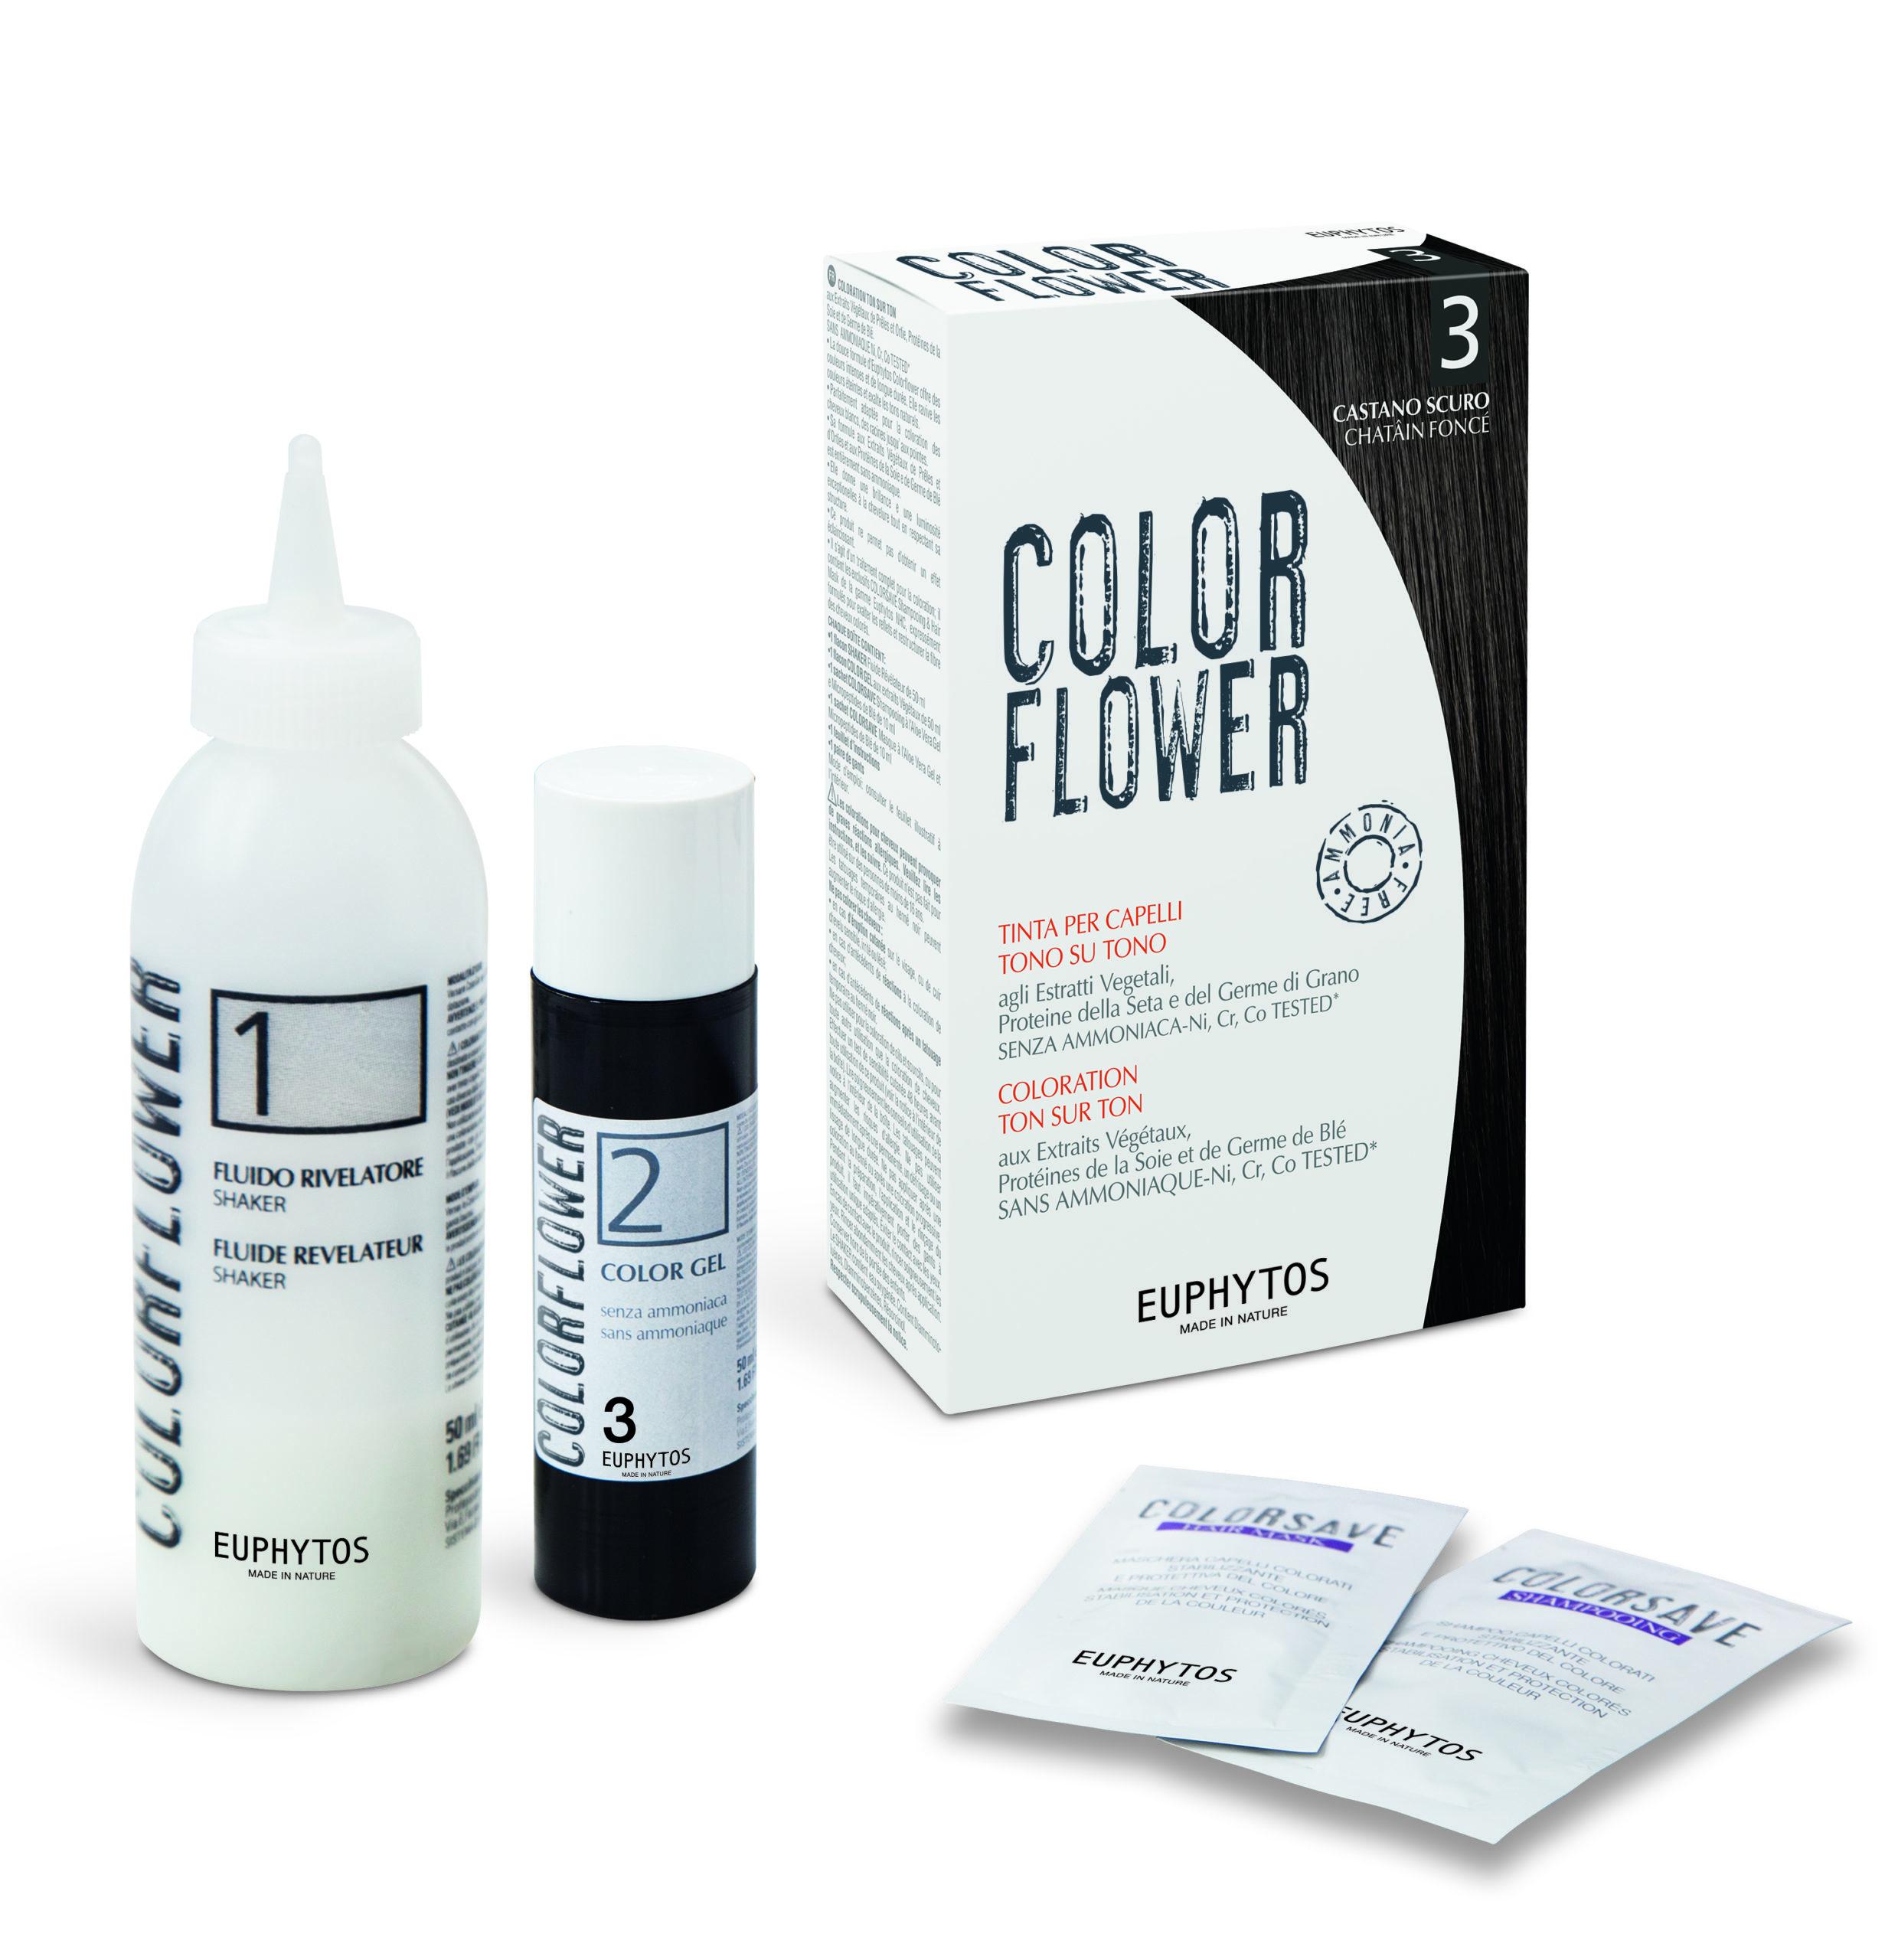 Pack-Color-Flower-3-scaled.jpg